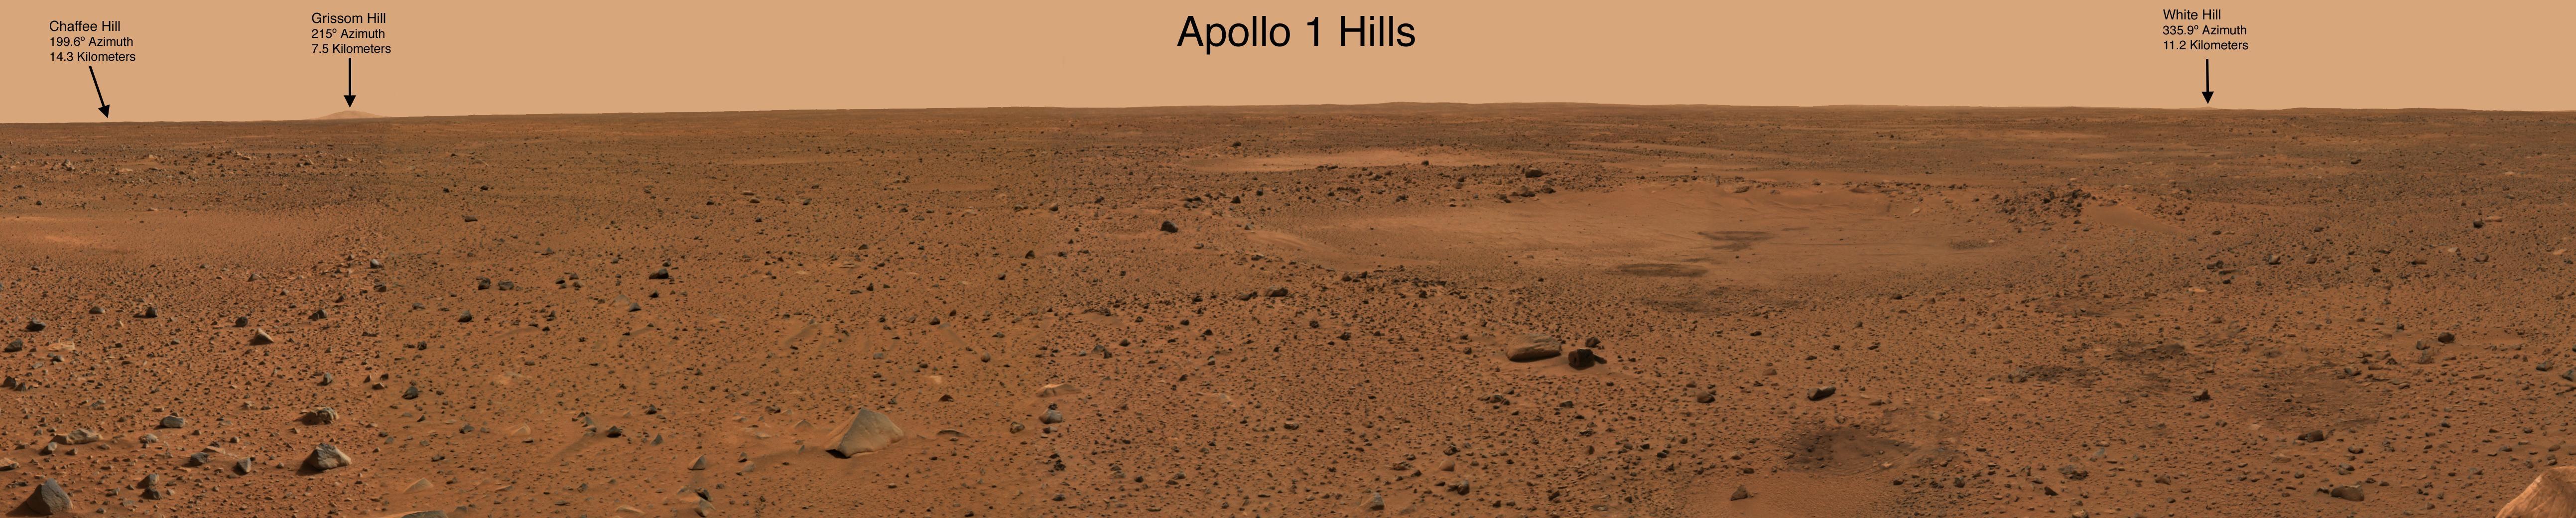 Main_Apollo_Hills.jpg